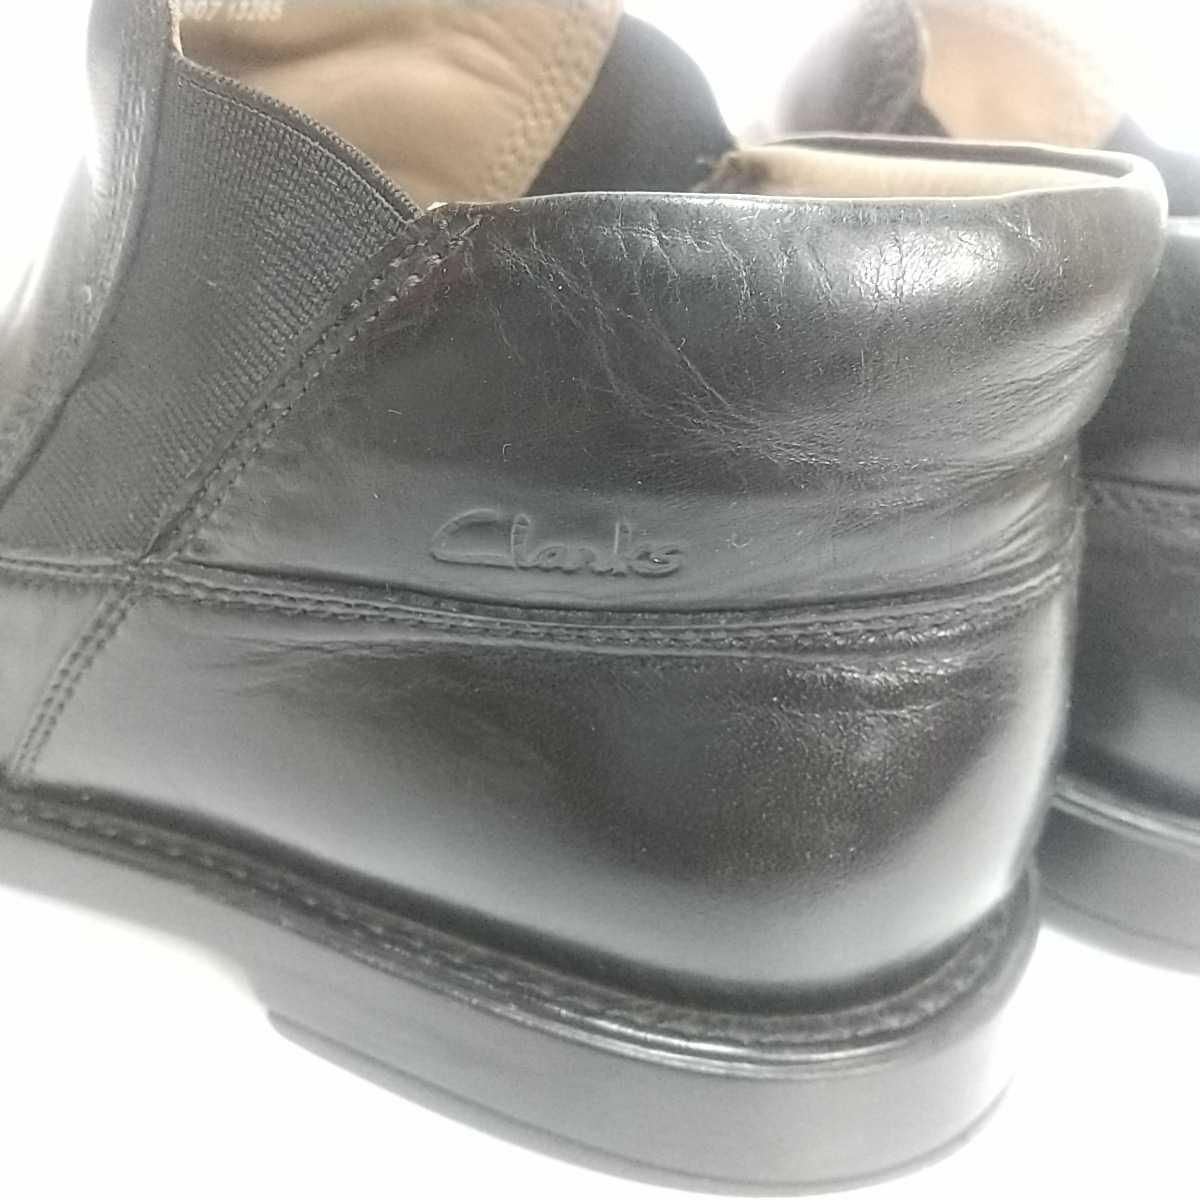 Clarks クラークス レザー サイドゴアブーツ ショート UK9 27.5cm 黒 ブラック 革靴 _画像10